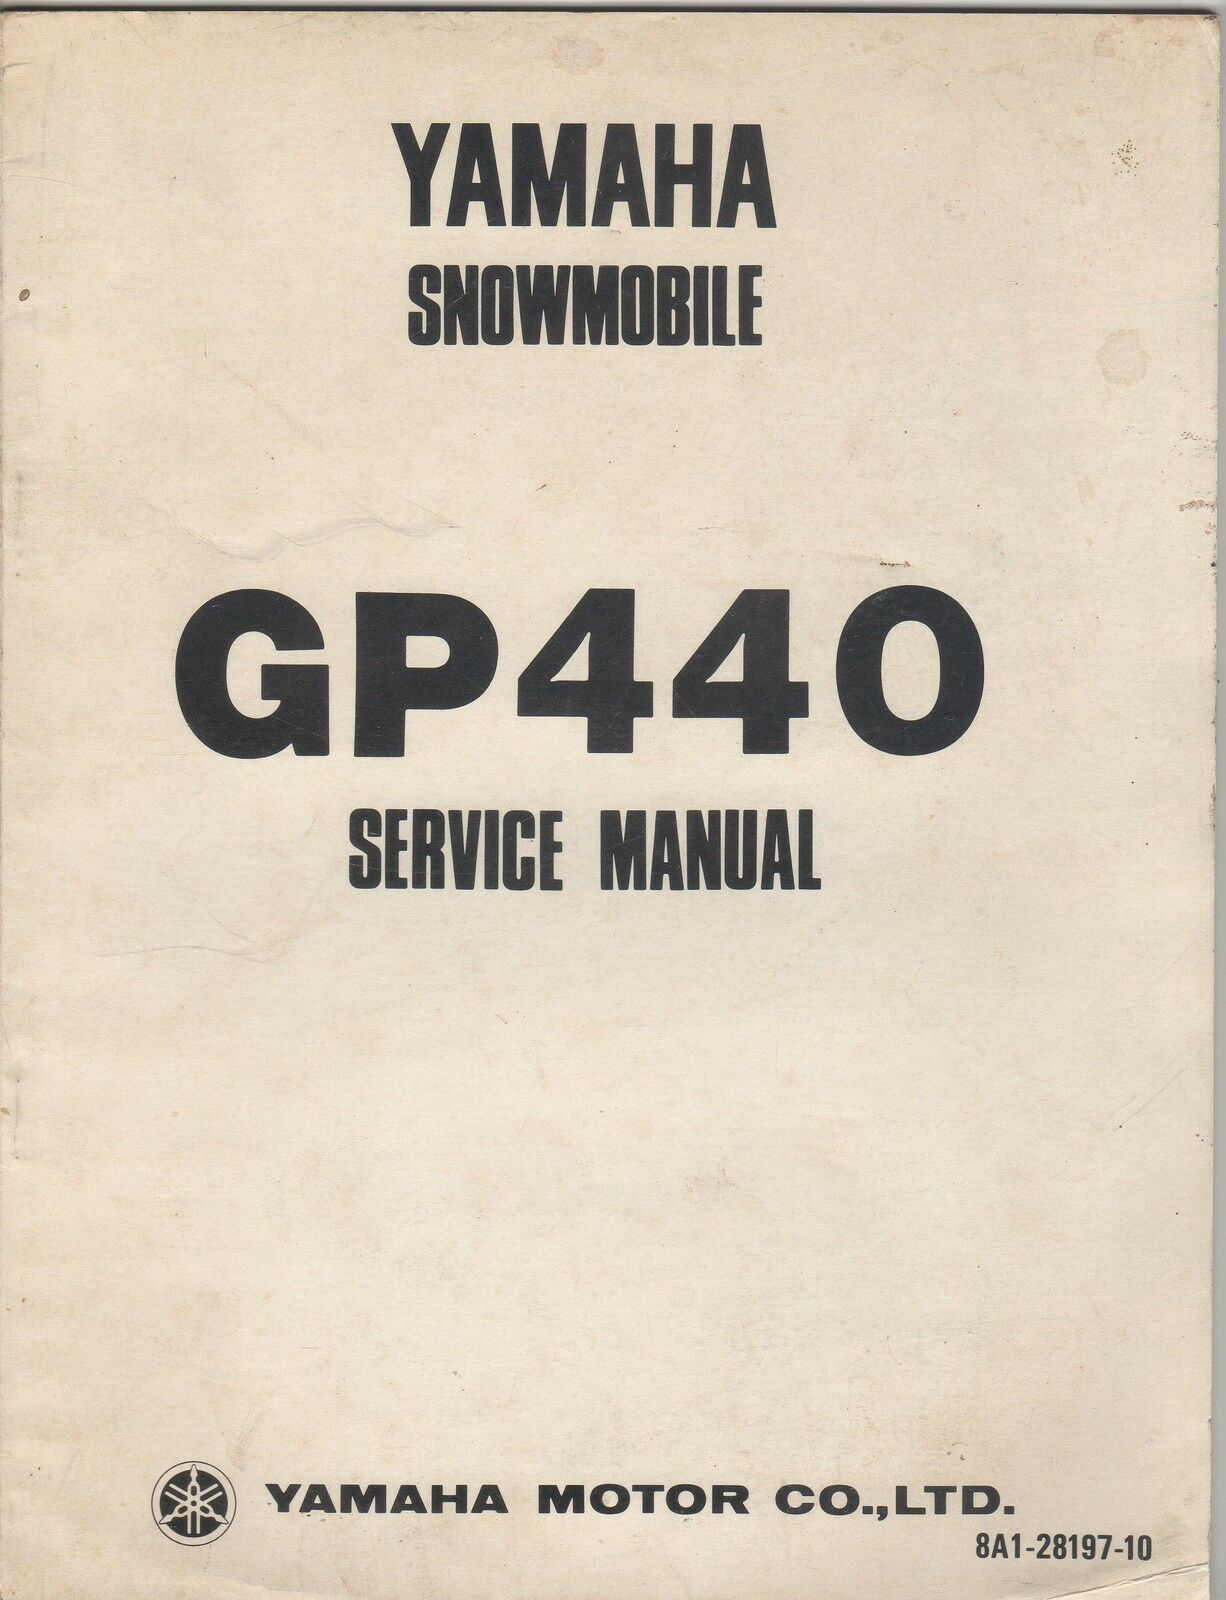 1976 YAMAHA SNOWMOBILE GP440  LIT-12618-A1-00  SERVICE MANUAL (511)